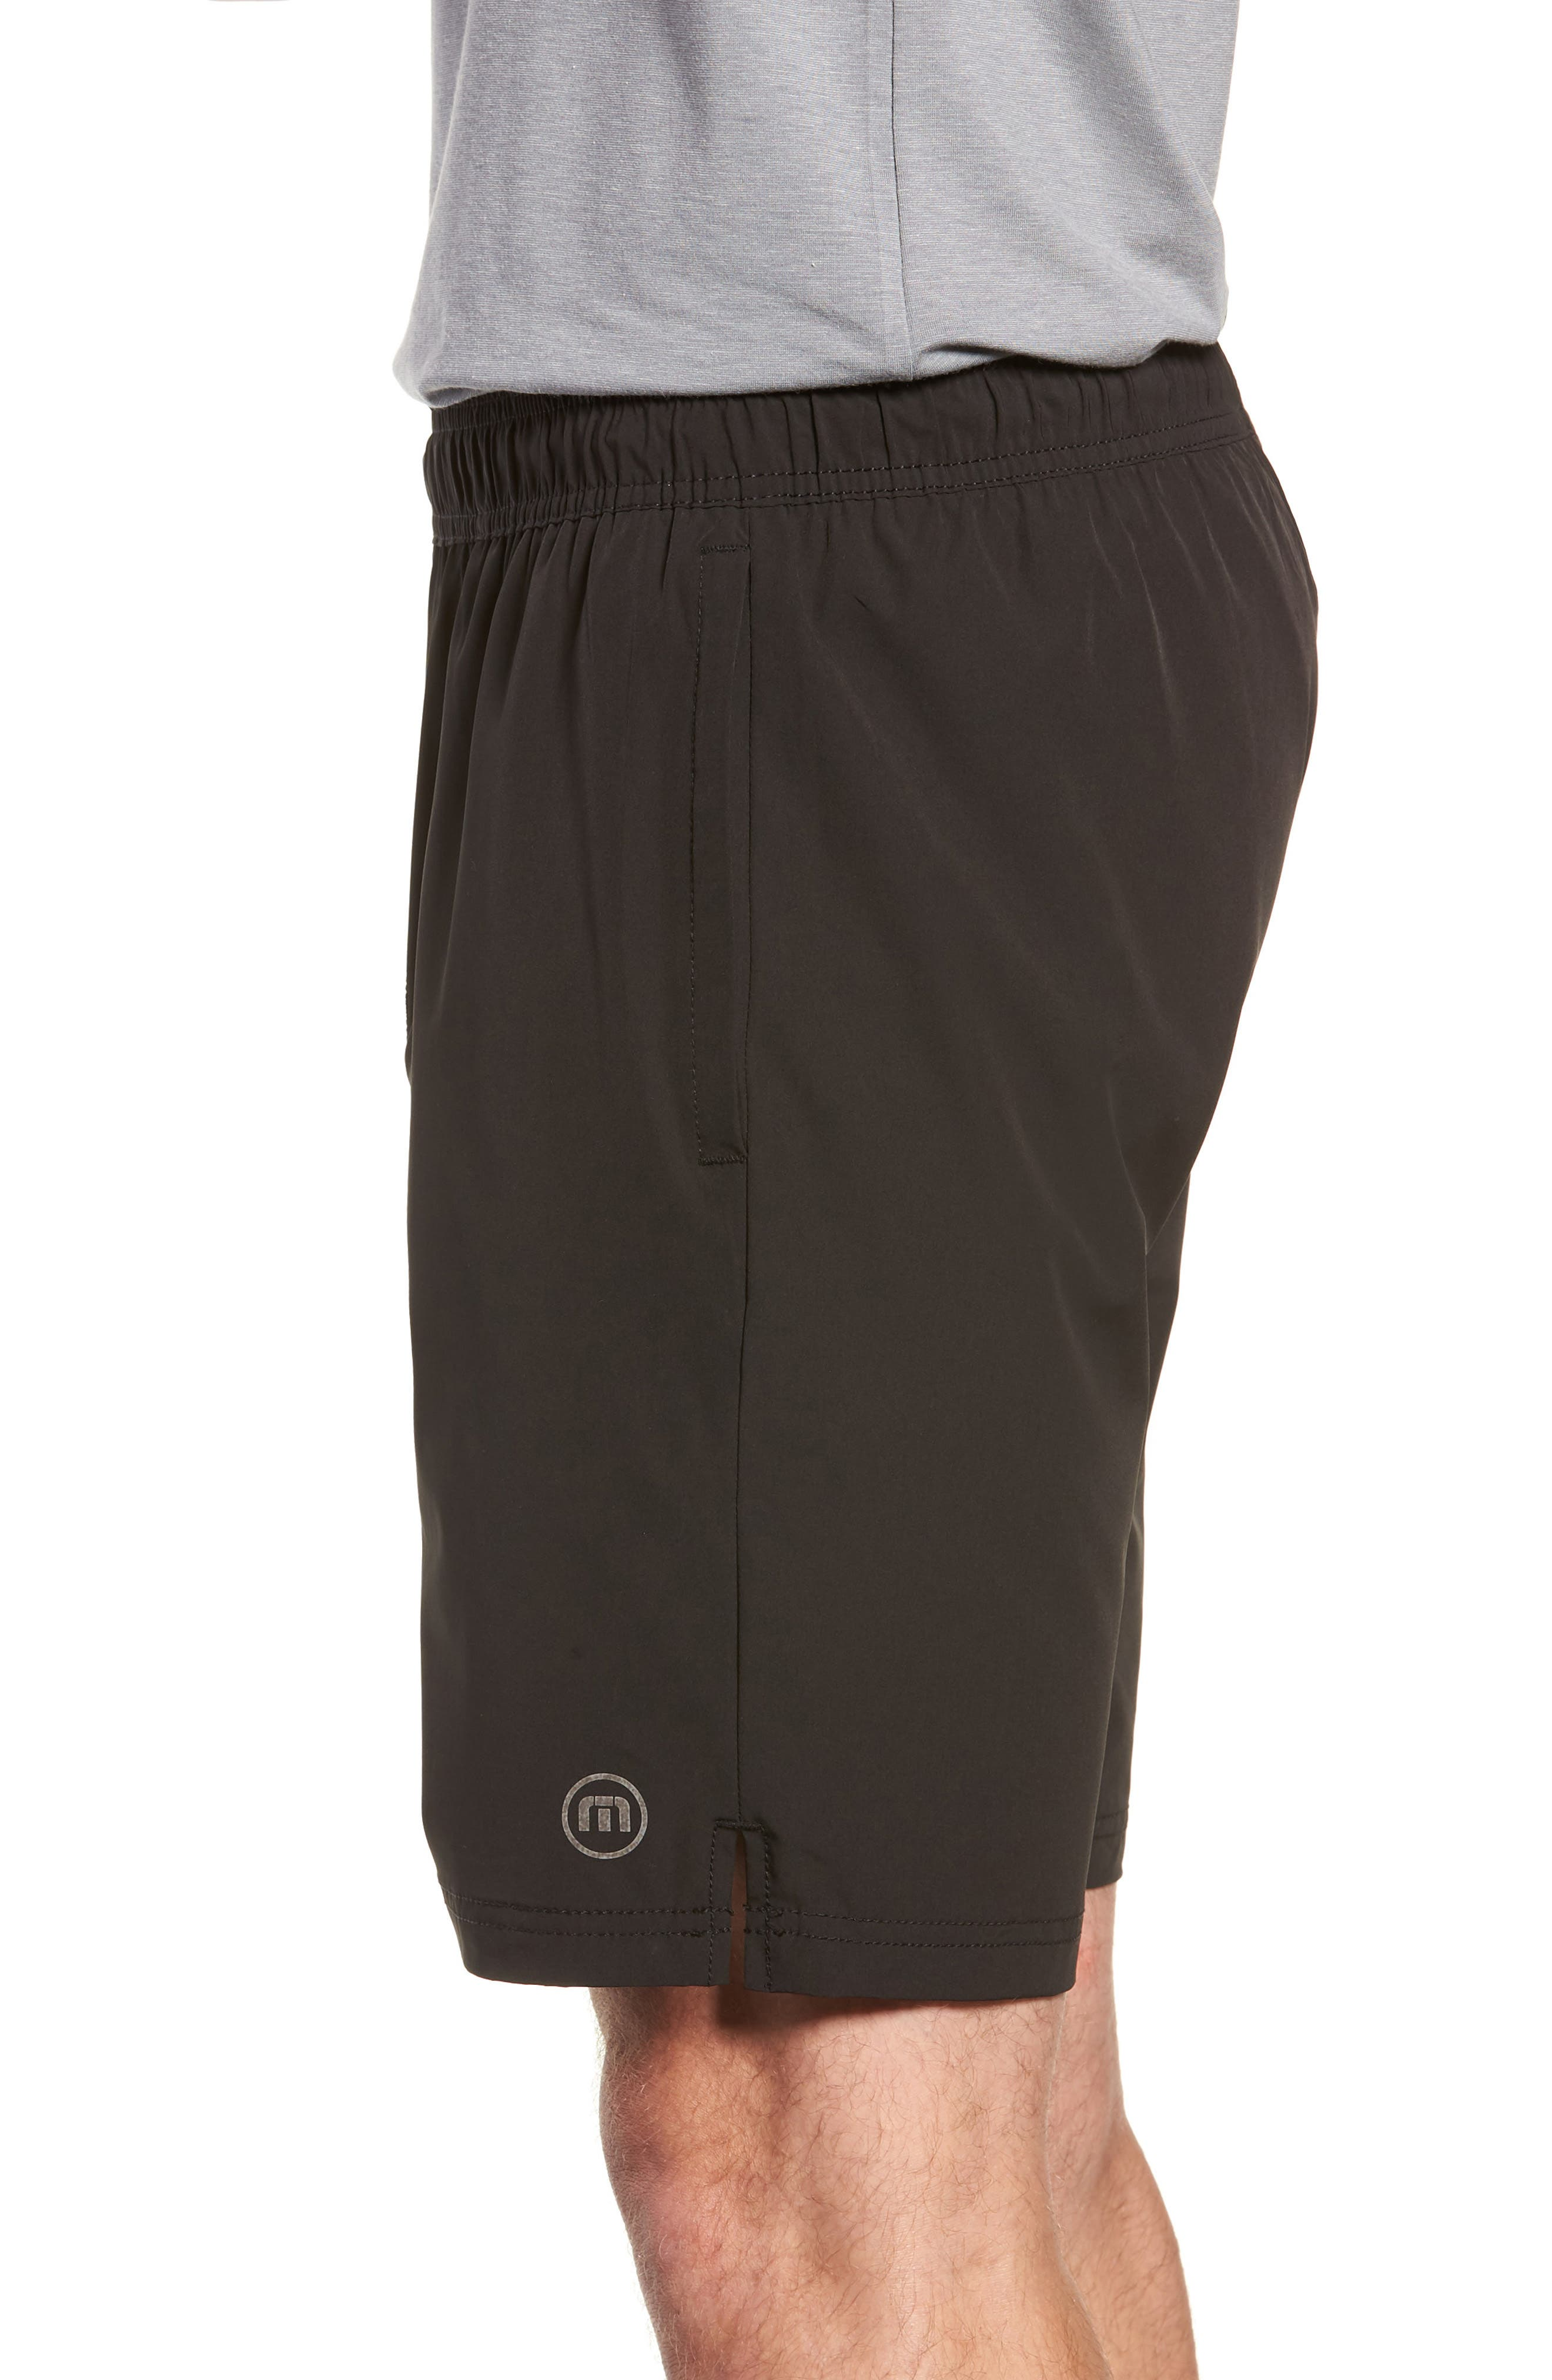 Deering Shorts,                             Alternate thumbnail 3, color,                             BLACK